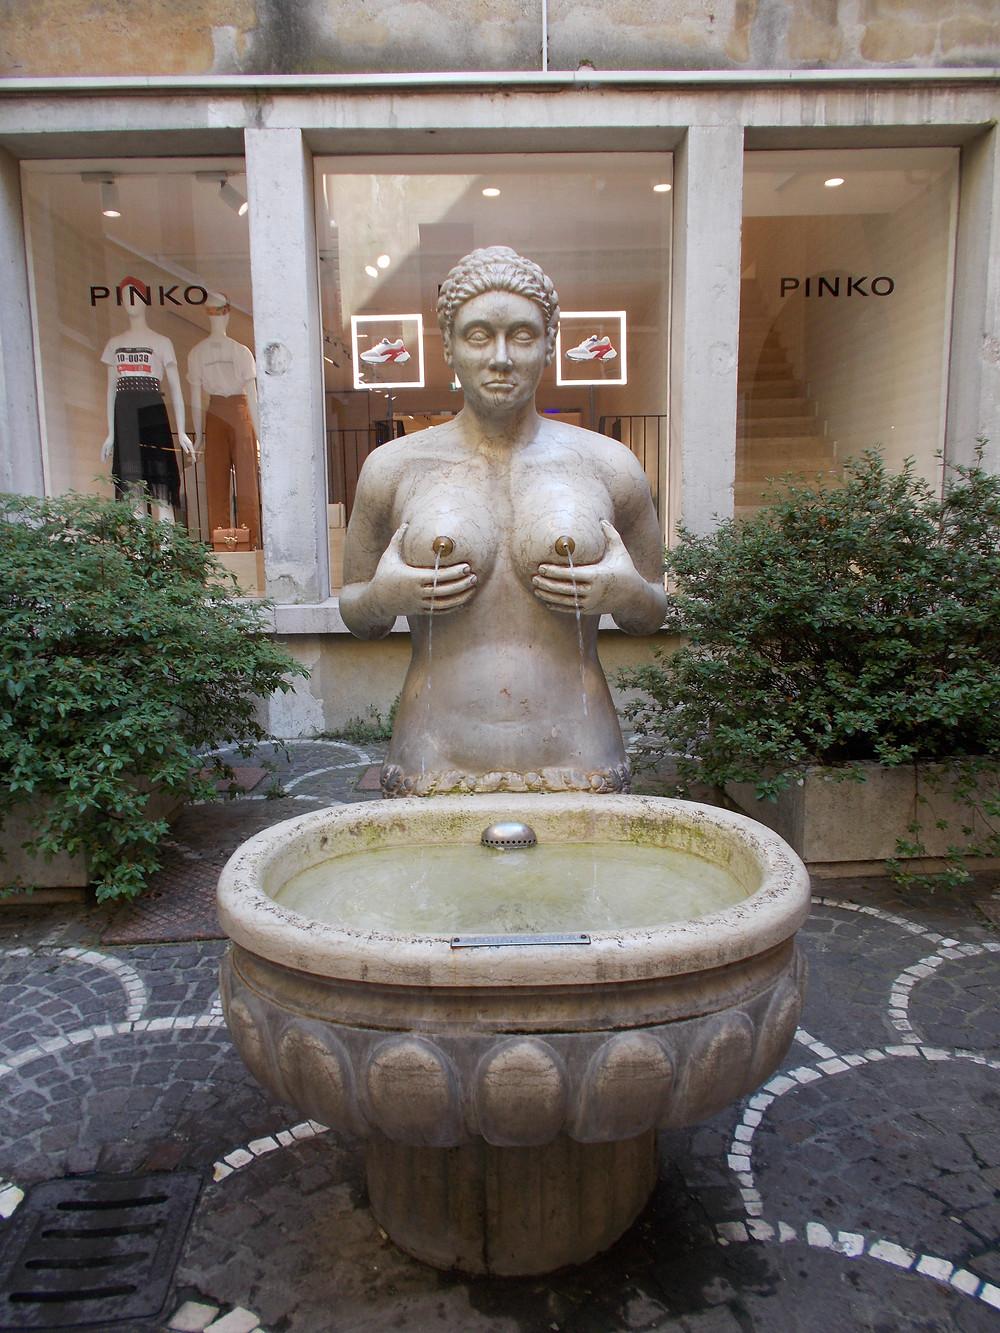 Fontana delle tette